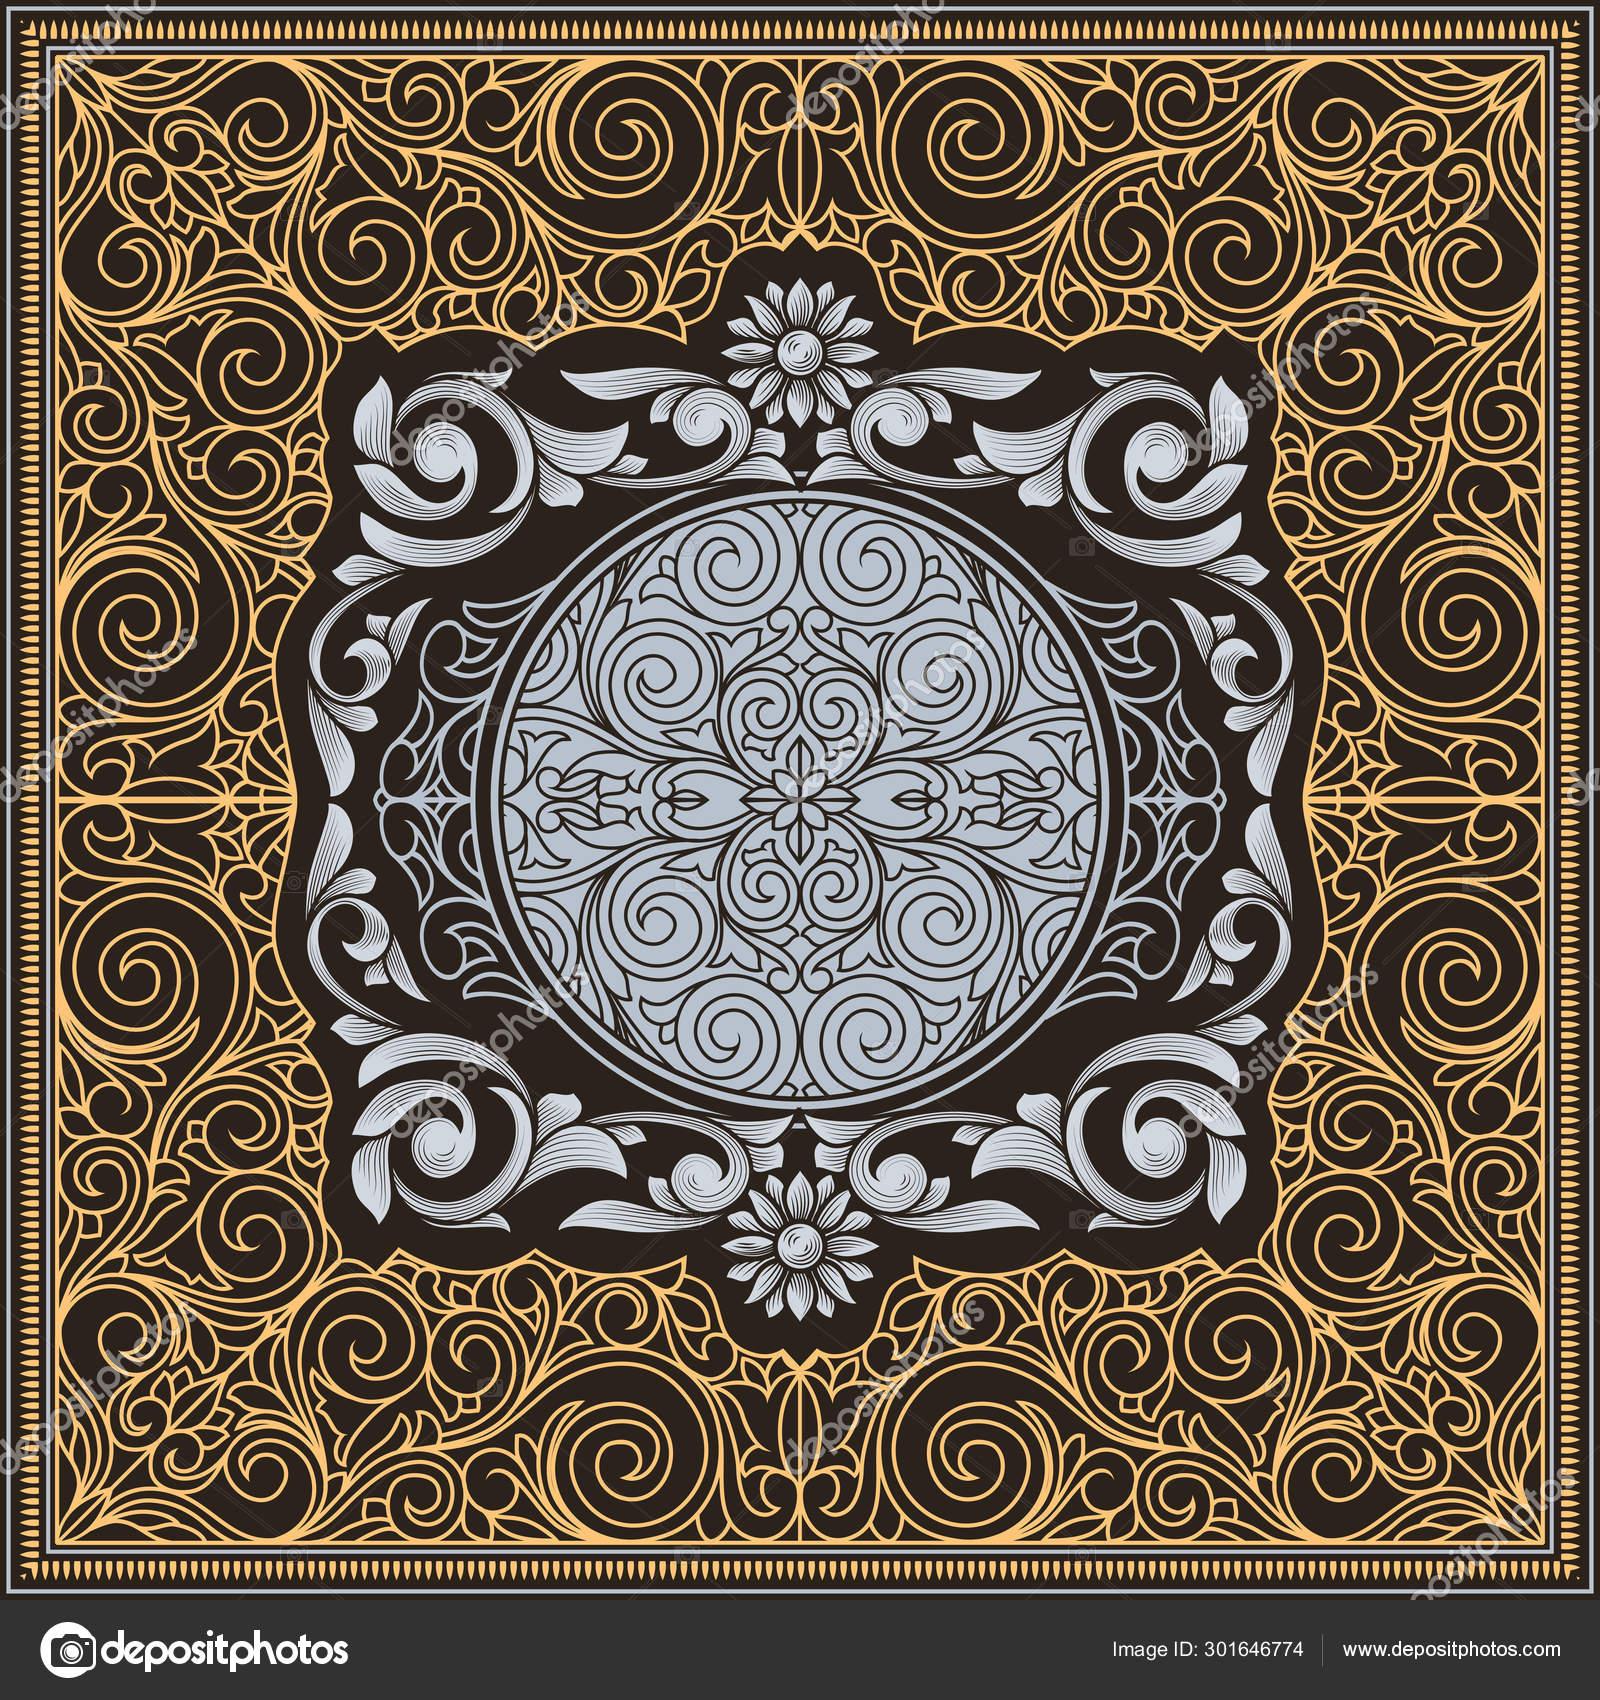 Vintage Dekorative Kunstvolle Design Karte Vektorgrafik Lizenzfreie Grafiken C Alex Scholar 301646774 Depositphotos